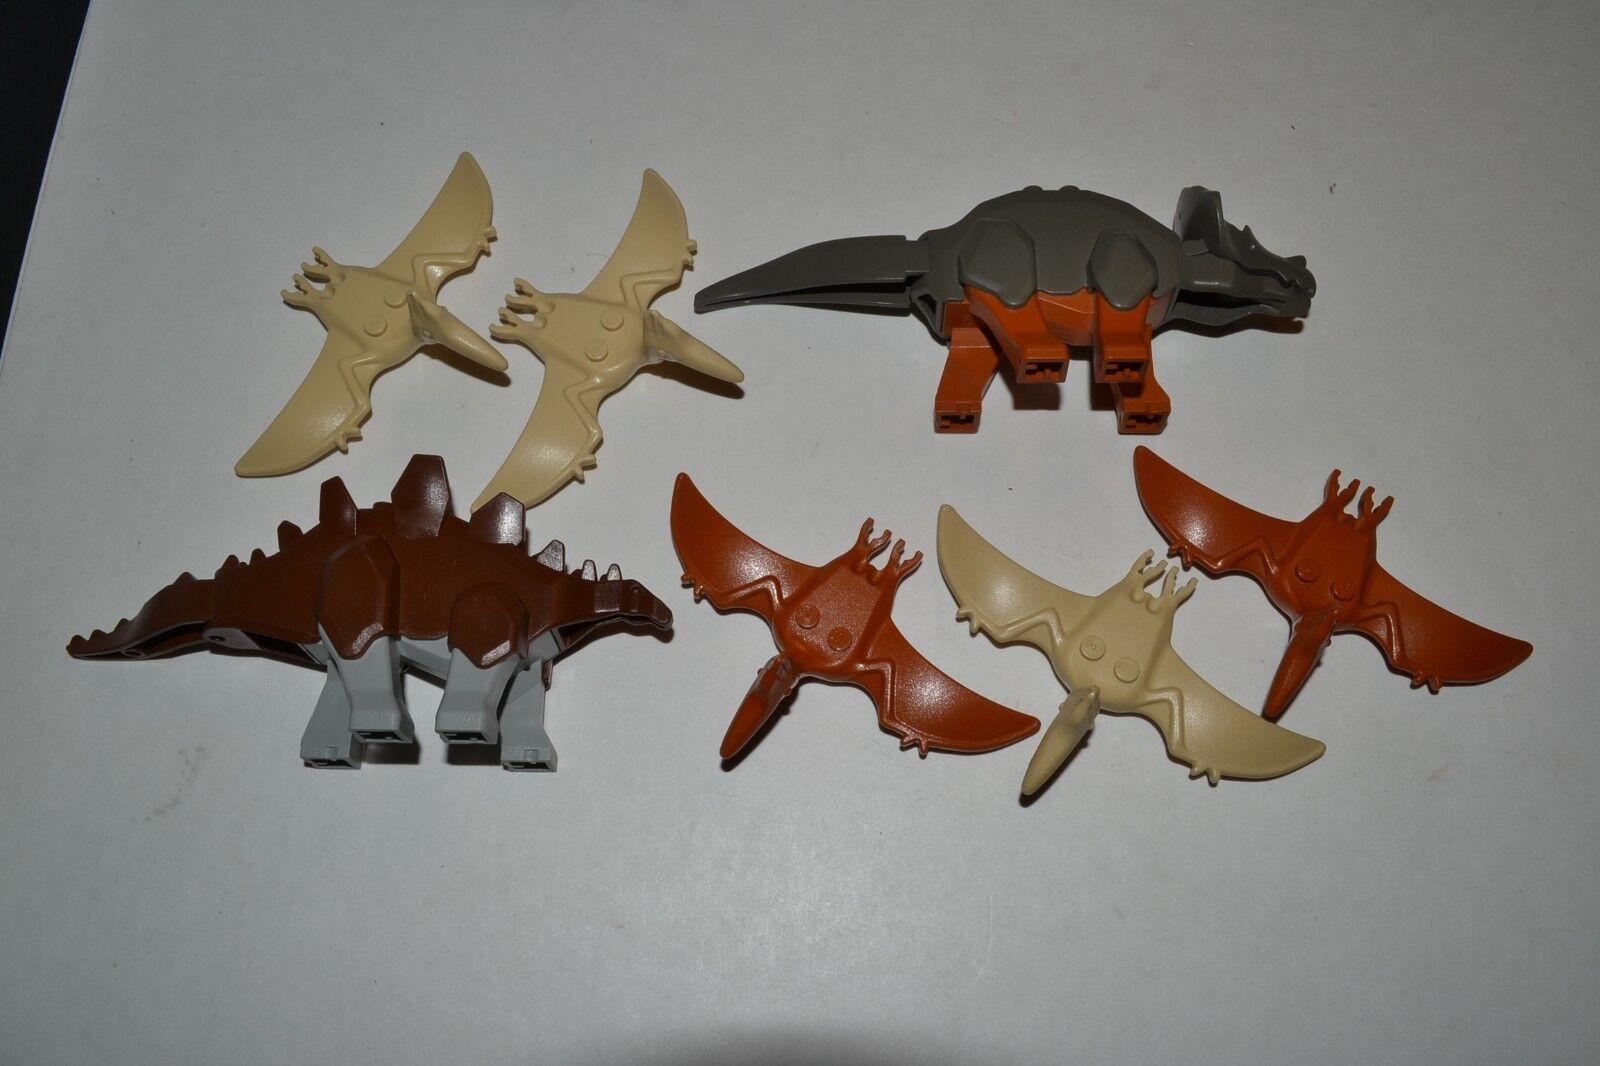 LEGO Dinosaur Lot Triceratops Stegosaurus Stegosaurus Stegosaurus Pterodactyl Pteranodon Animal ACZA a0291d